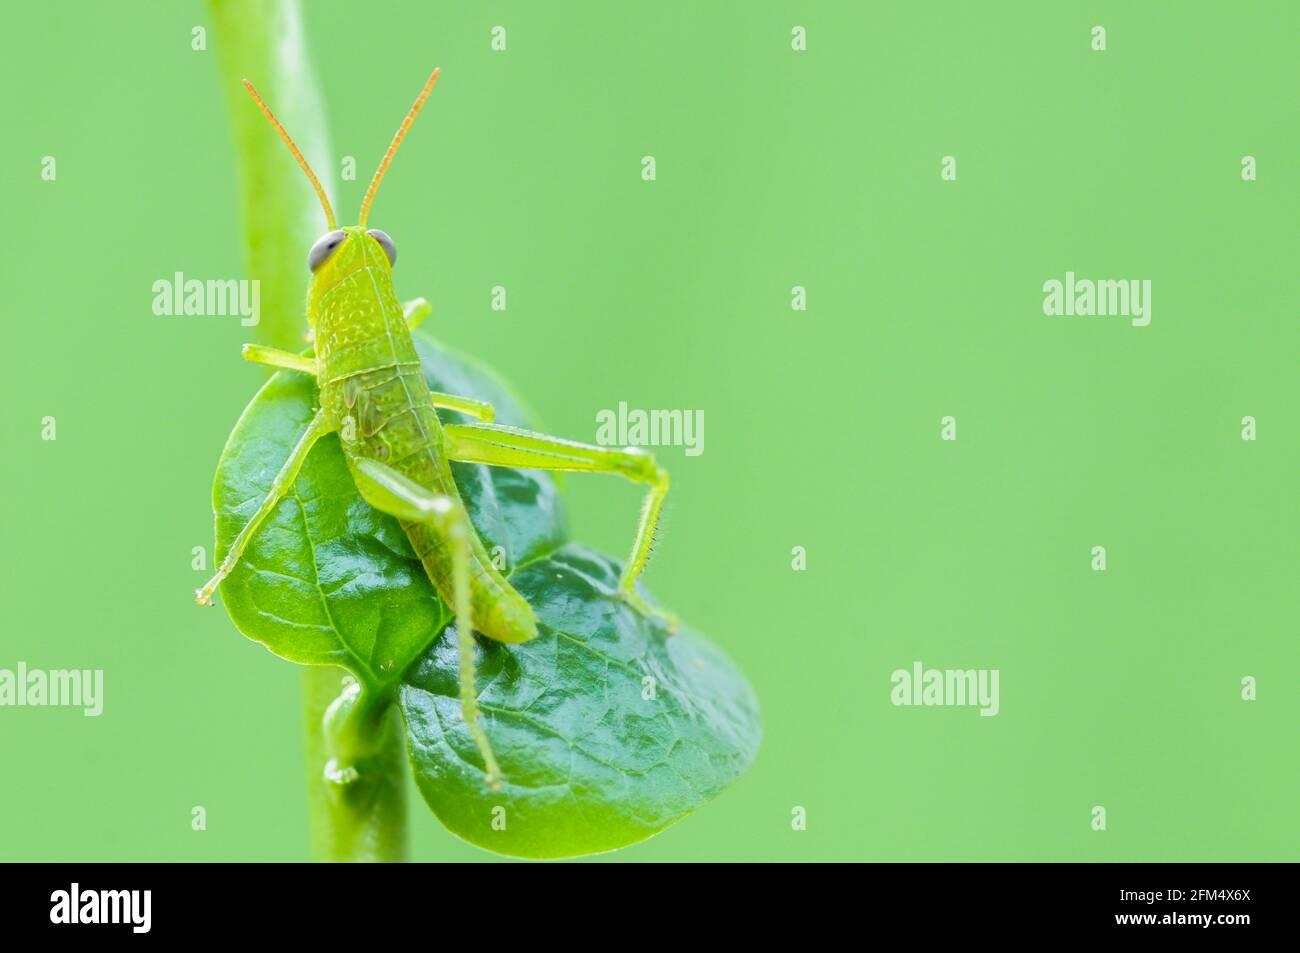 Saltamontes verdes colgando de la hoja sobre fondo verde Foto de stock